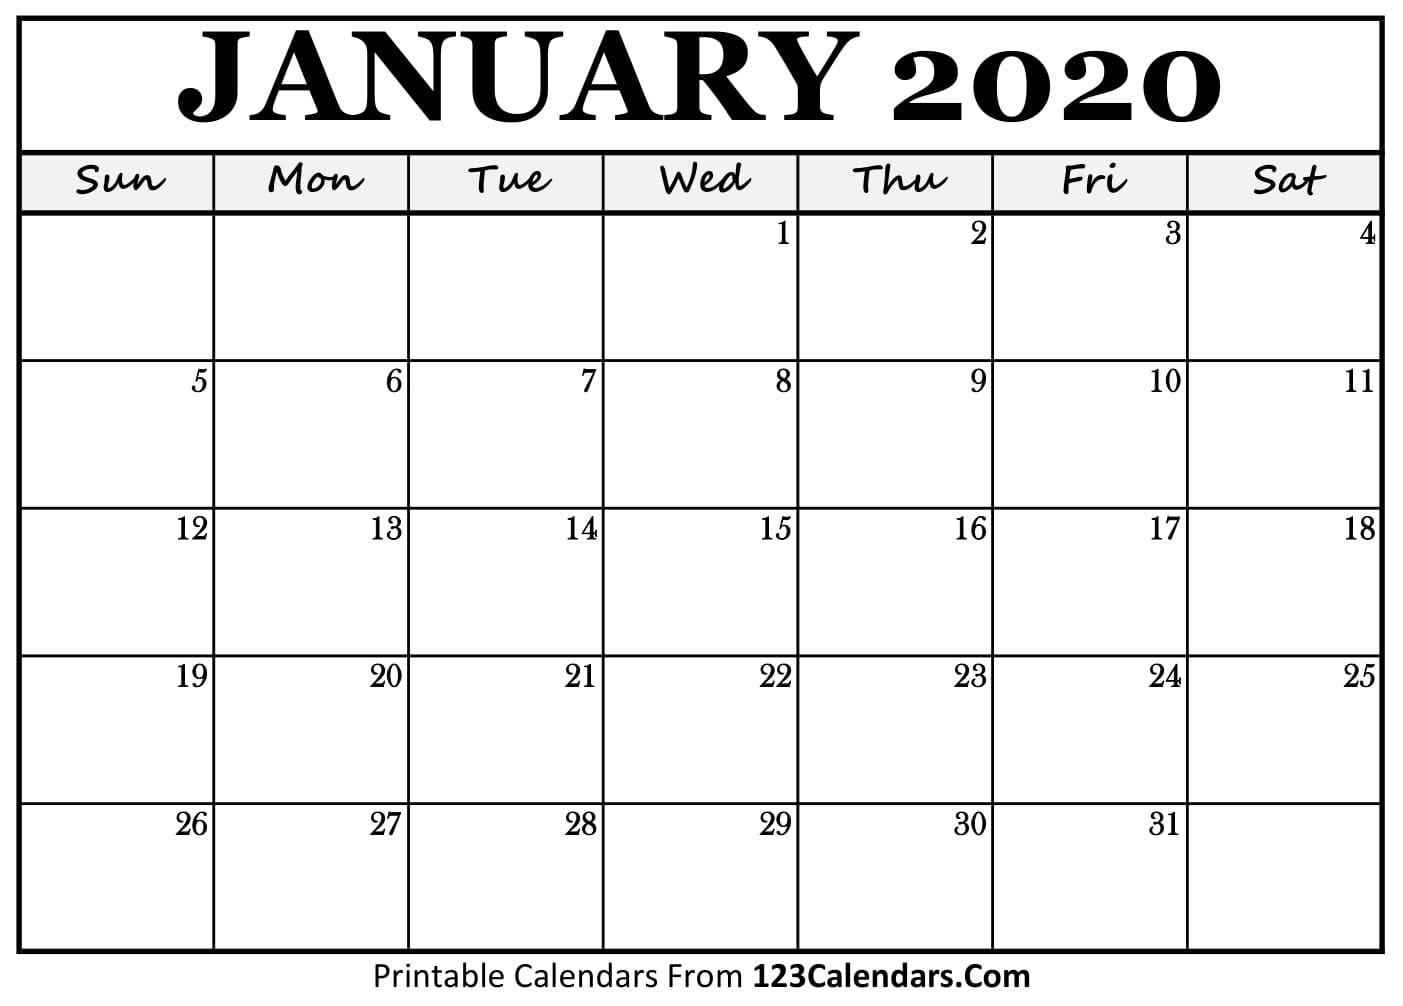 Free Printable Calendar | 123Calendars  Free Printable Calendar Templates